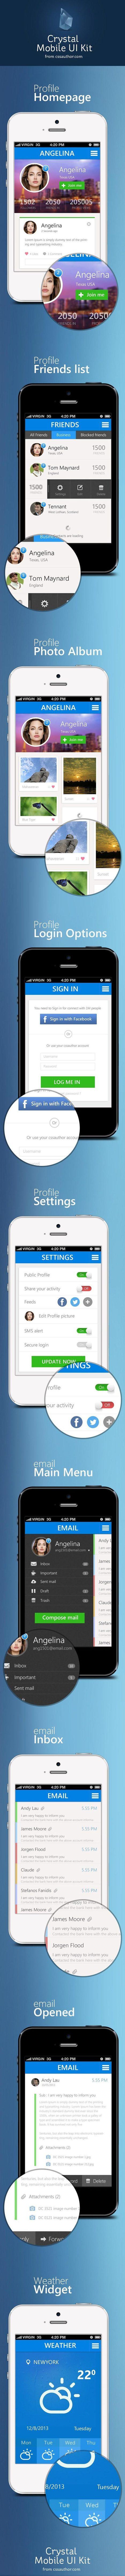 Crystal - Mobile Application UI Design PSD - Freebie No: 97 | UI Design PSD | Scoop.it